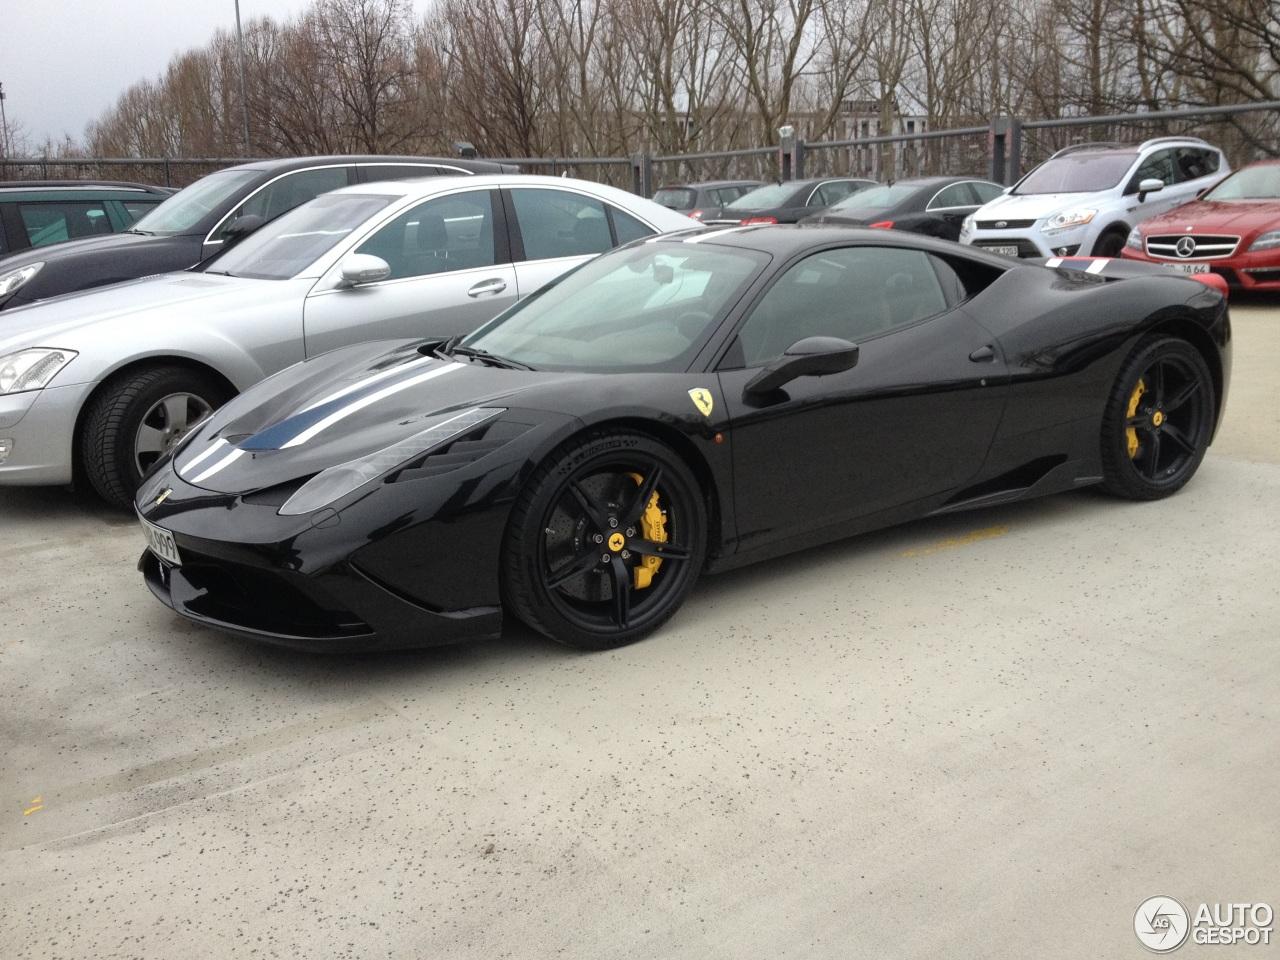 2017 Ferrari 458 Price >> Ferrari 458 Speciale - 24 February 2014 - Autogespot